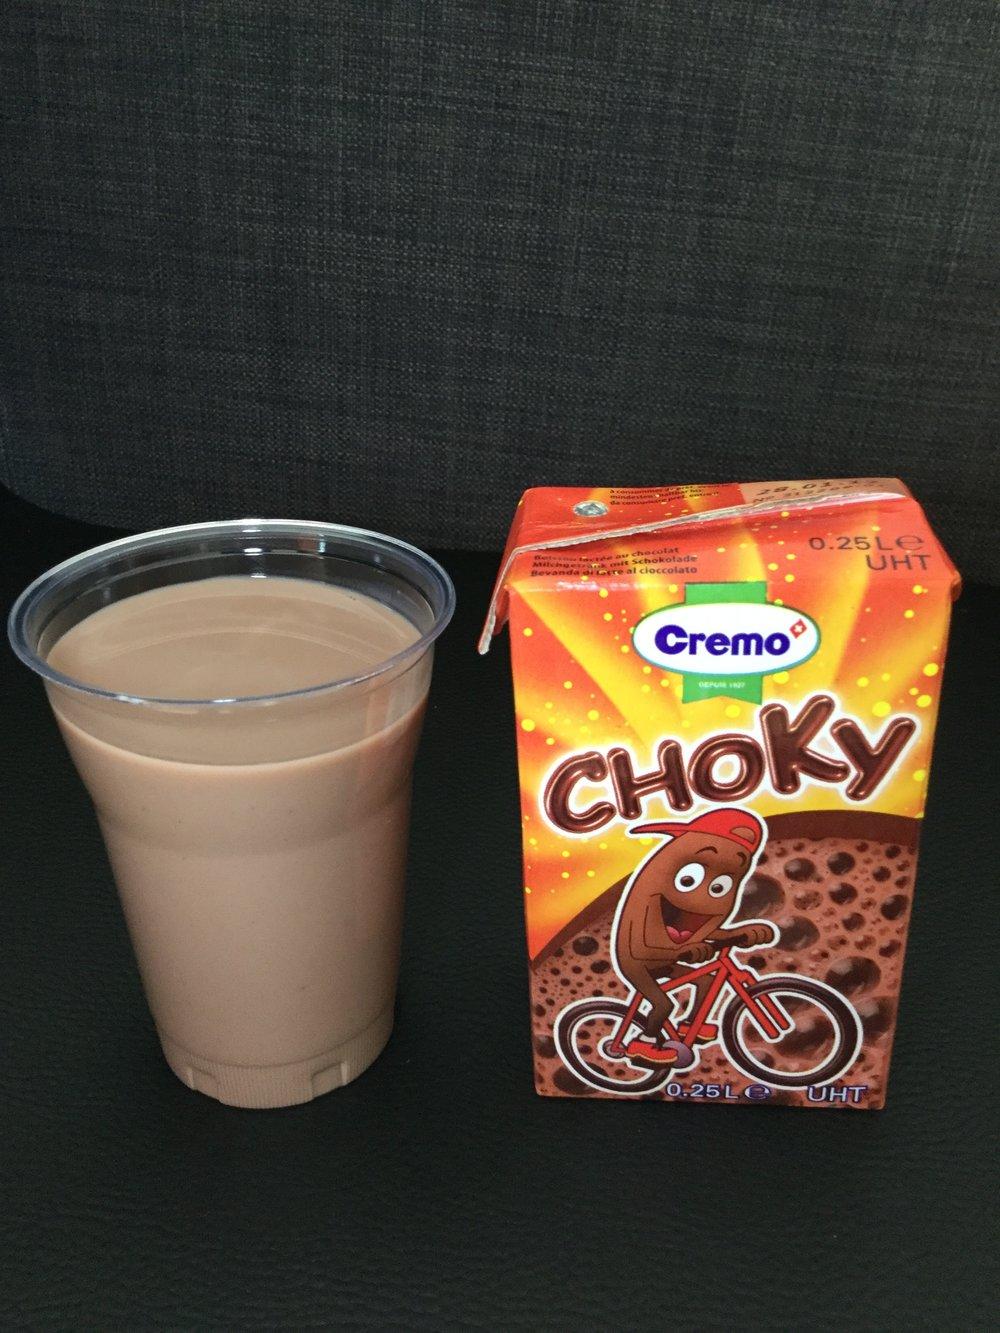 Cremo Choky Cup